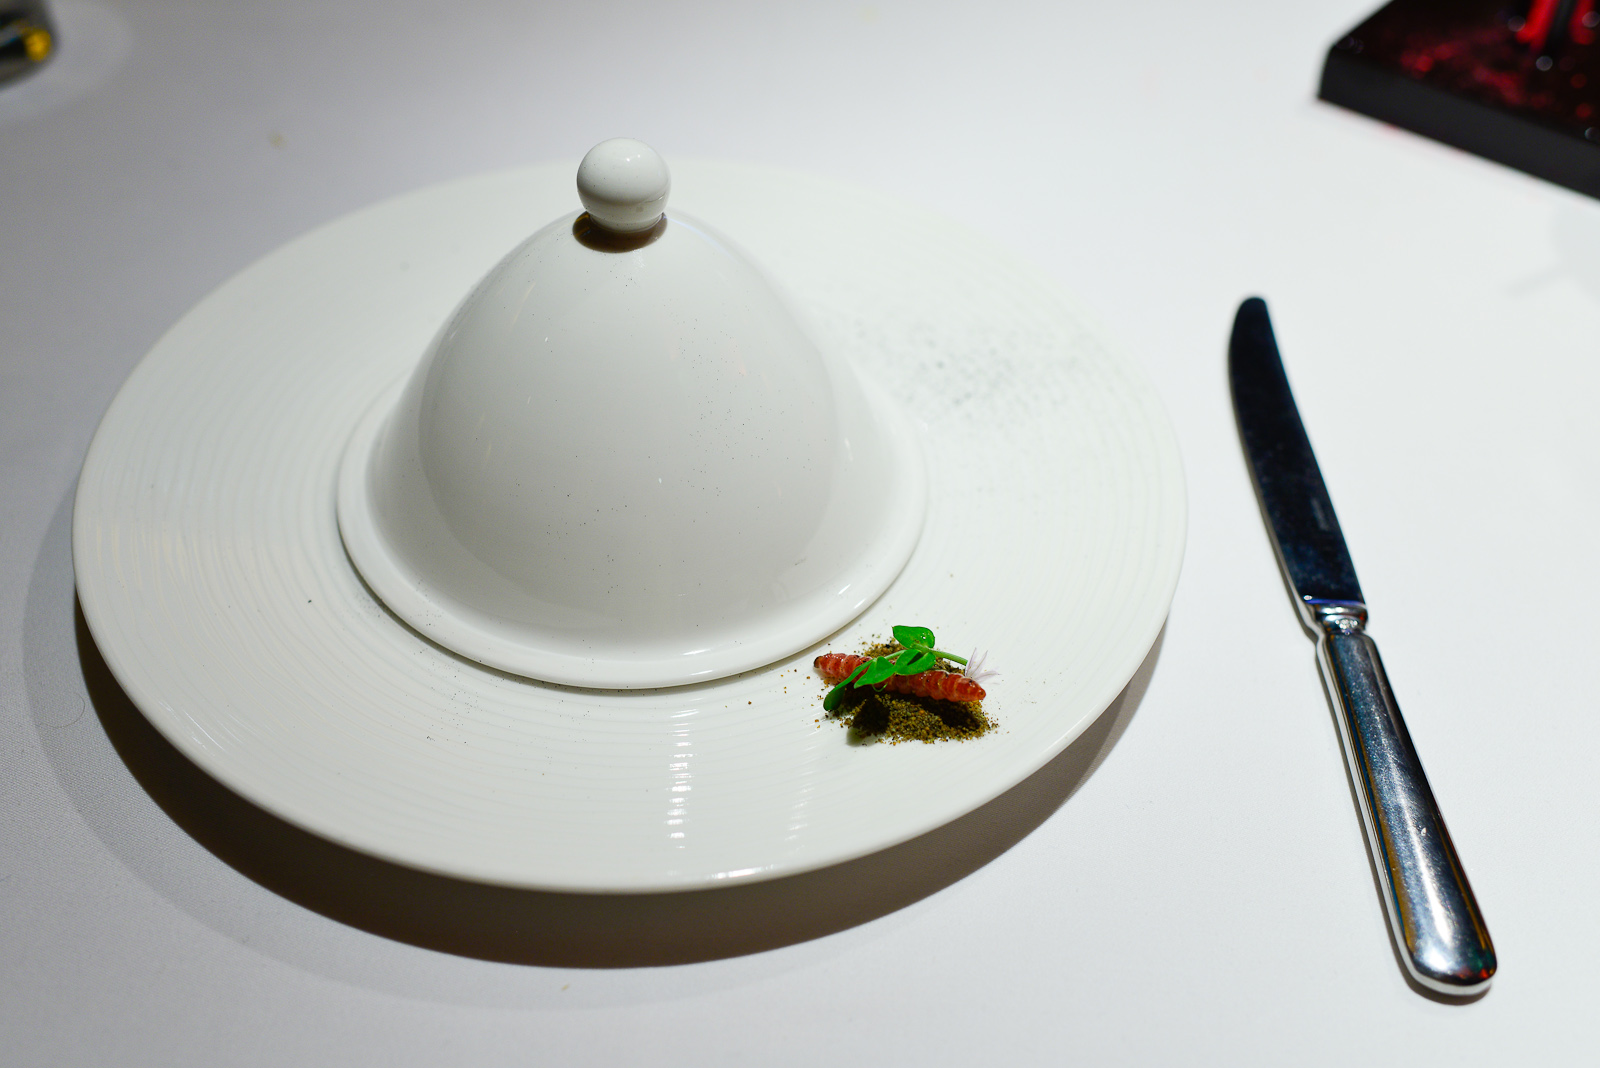 6th Course: Chinicuiles, salsa molcajeteada de chile Mixe, aguac